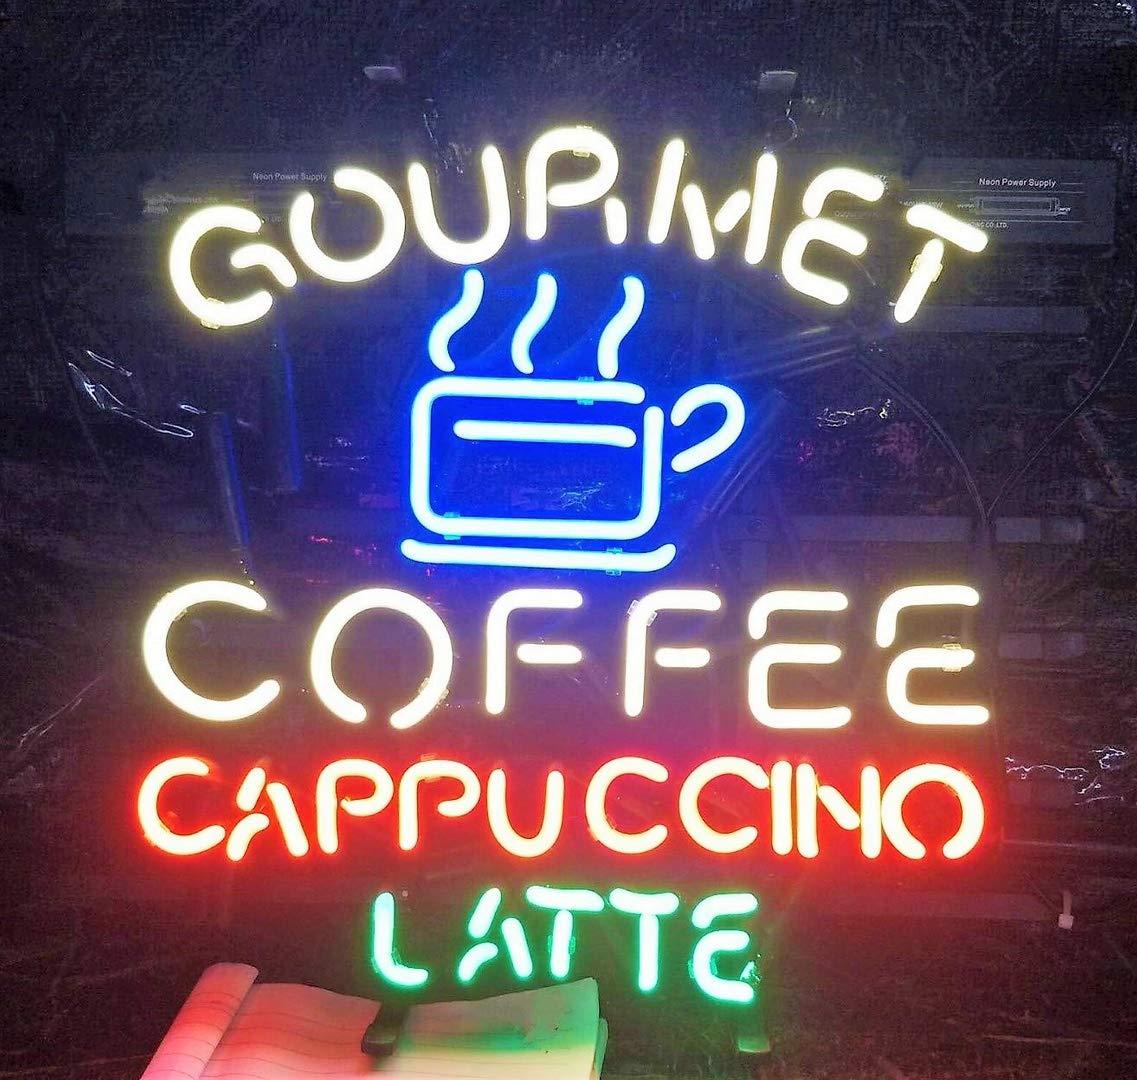 Queen Sense 24''x20'' Gourmet Coffee Cappuccino LatteNeon Sign (VariousSizes) Beer Bar Pub Man Cave Business Glass Lamp Light DC396